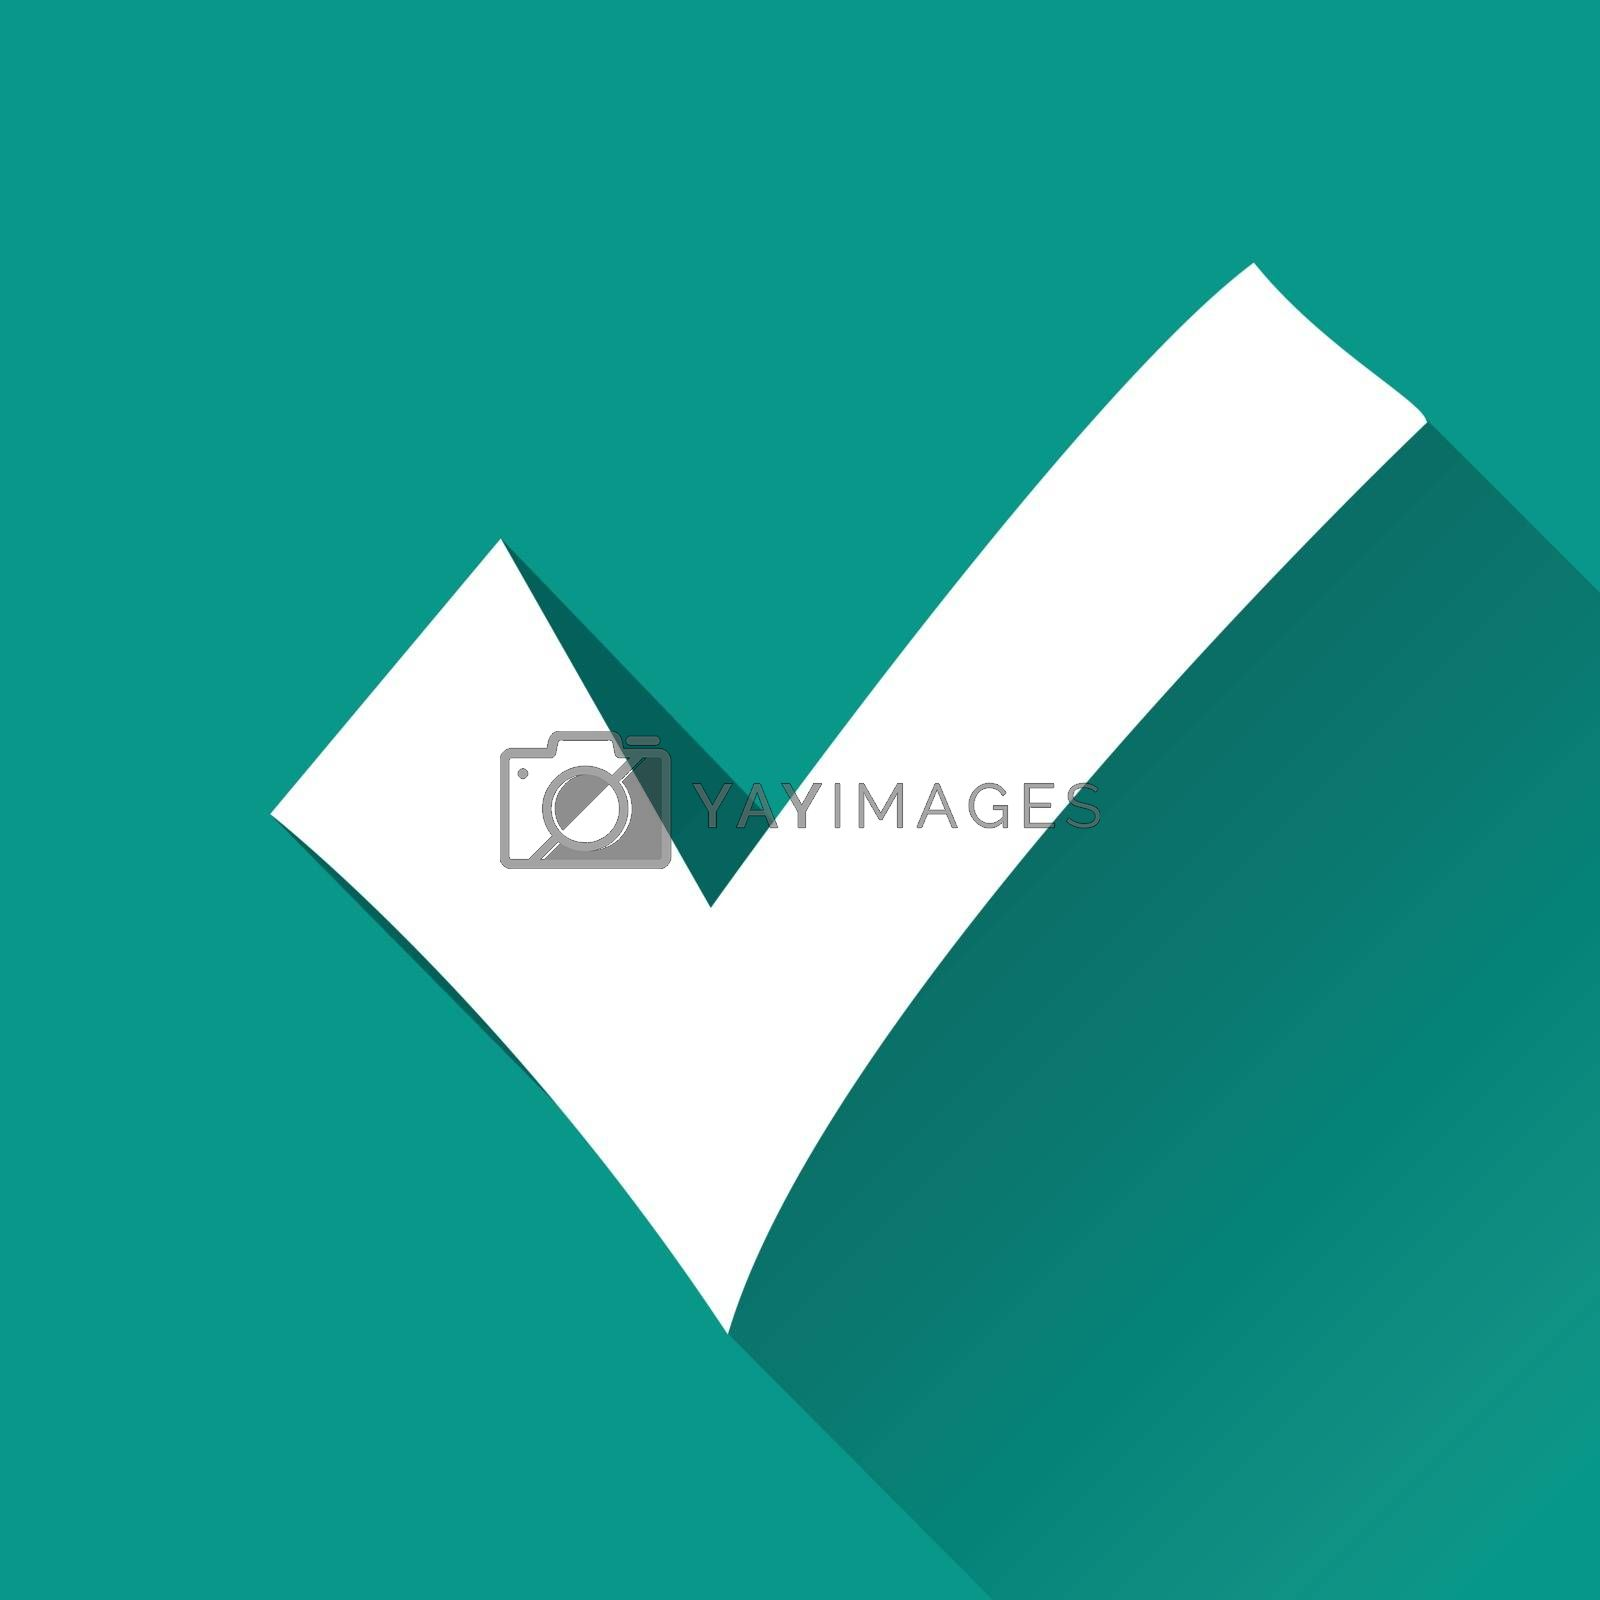 Royalty free image of checkmark flat design icon by nickylarson974